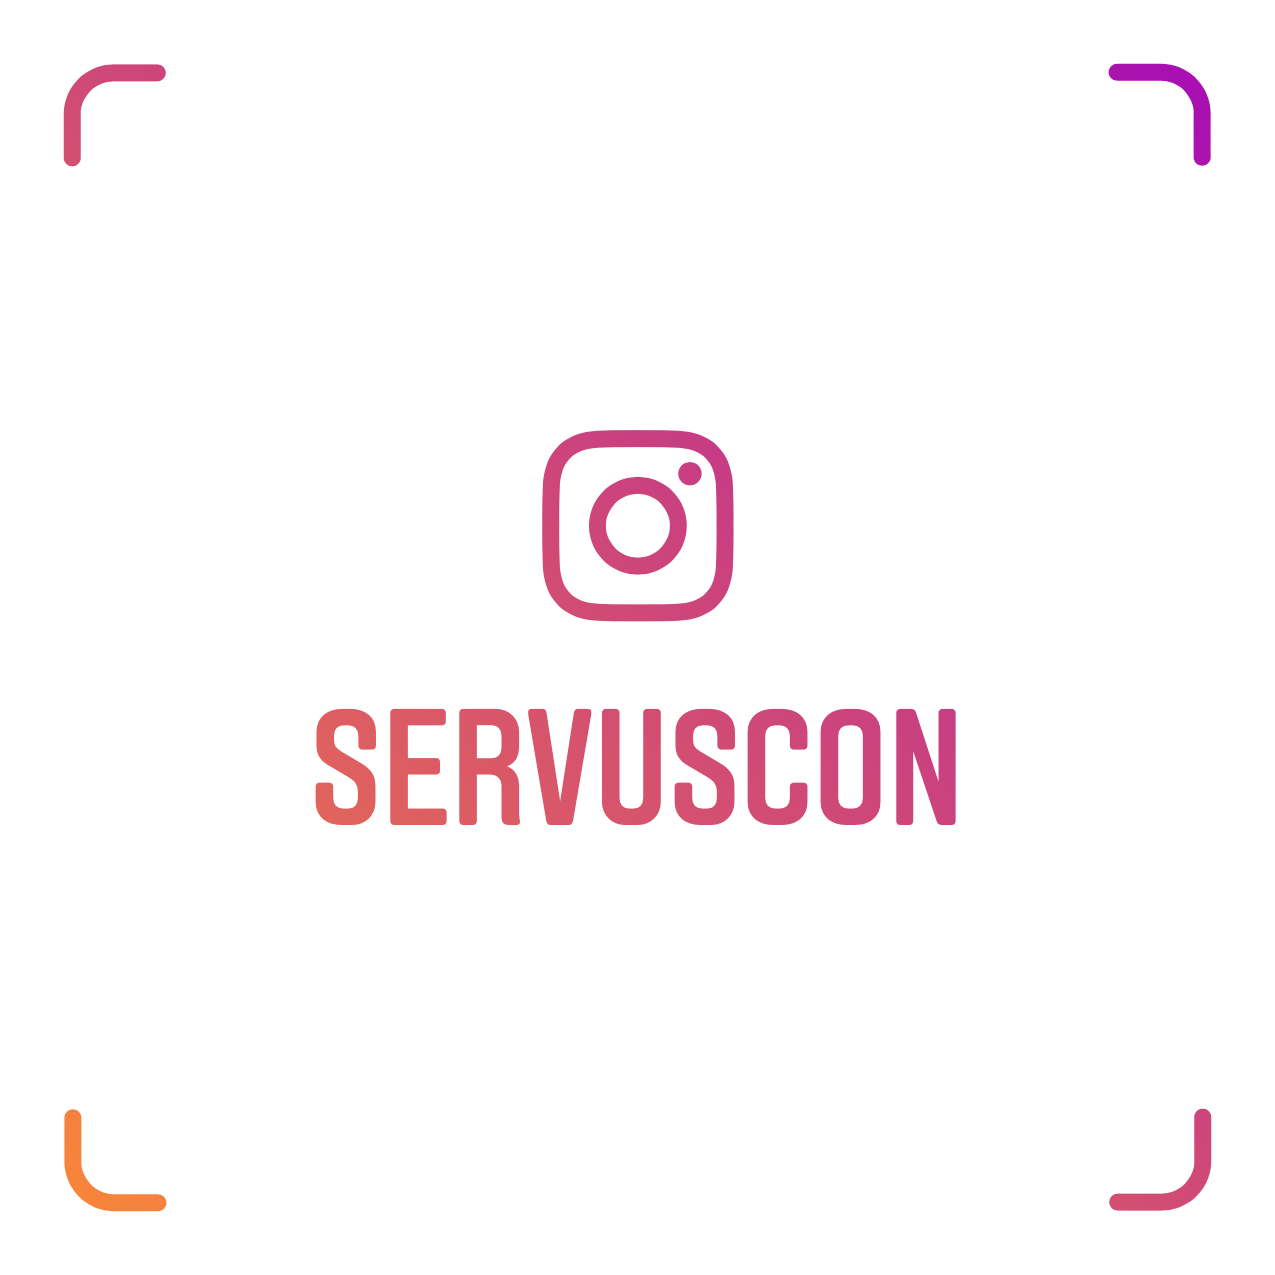 @SERVUSCON Instagram Name Tag